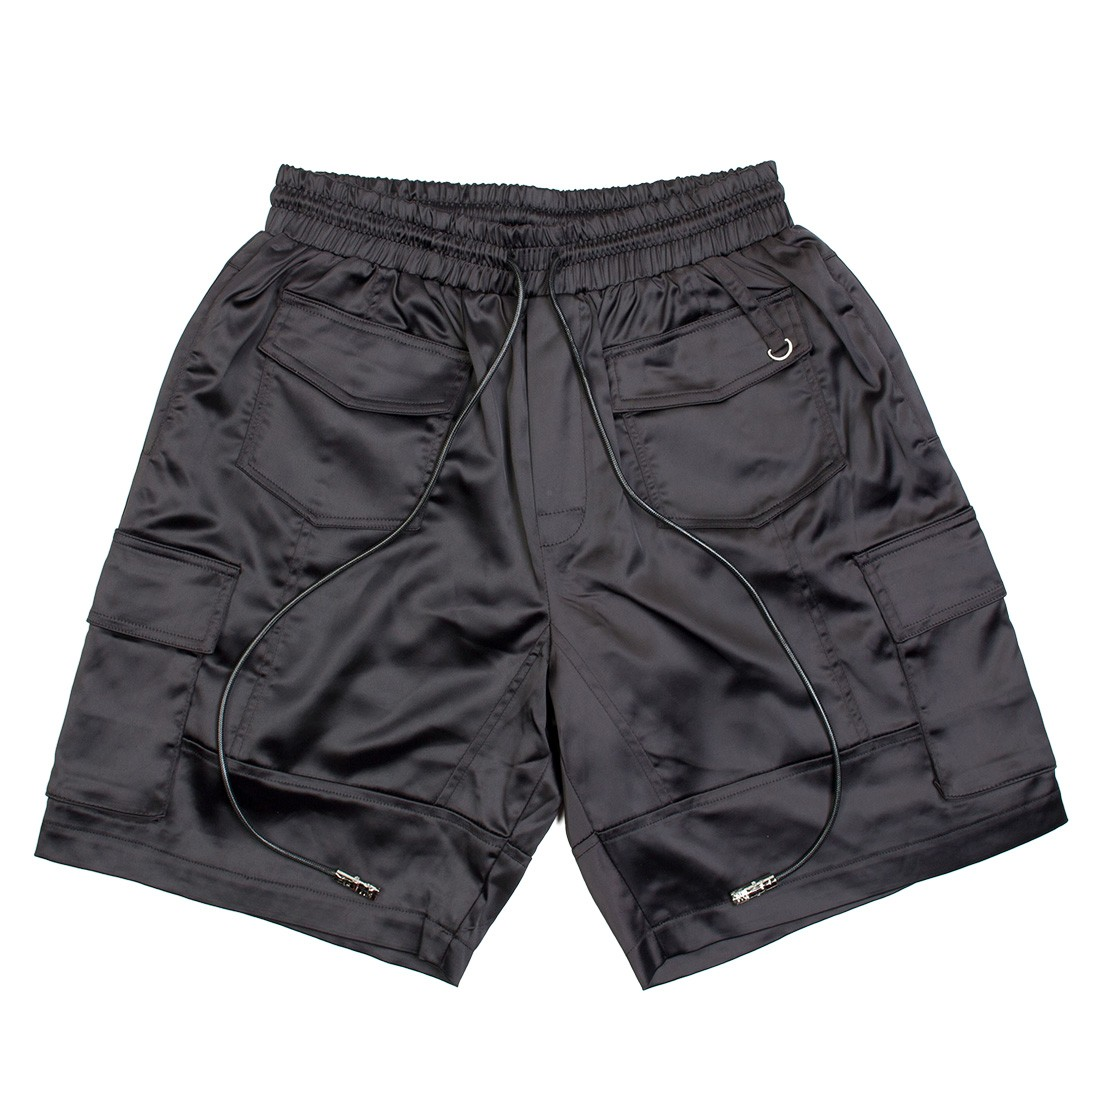 Lifted Anchors Men Digital Satin Cargo Shorts (black)